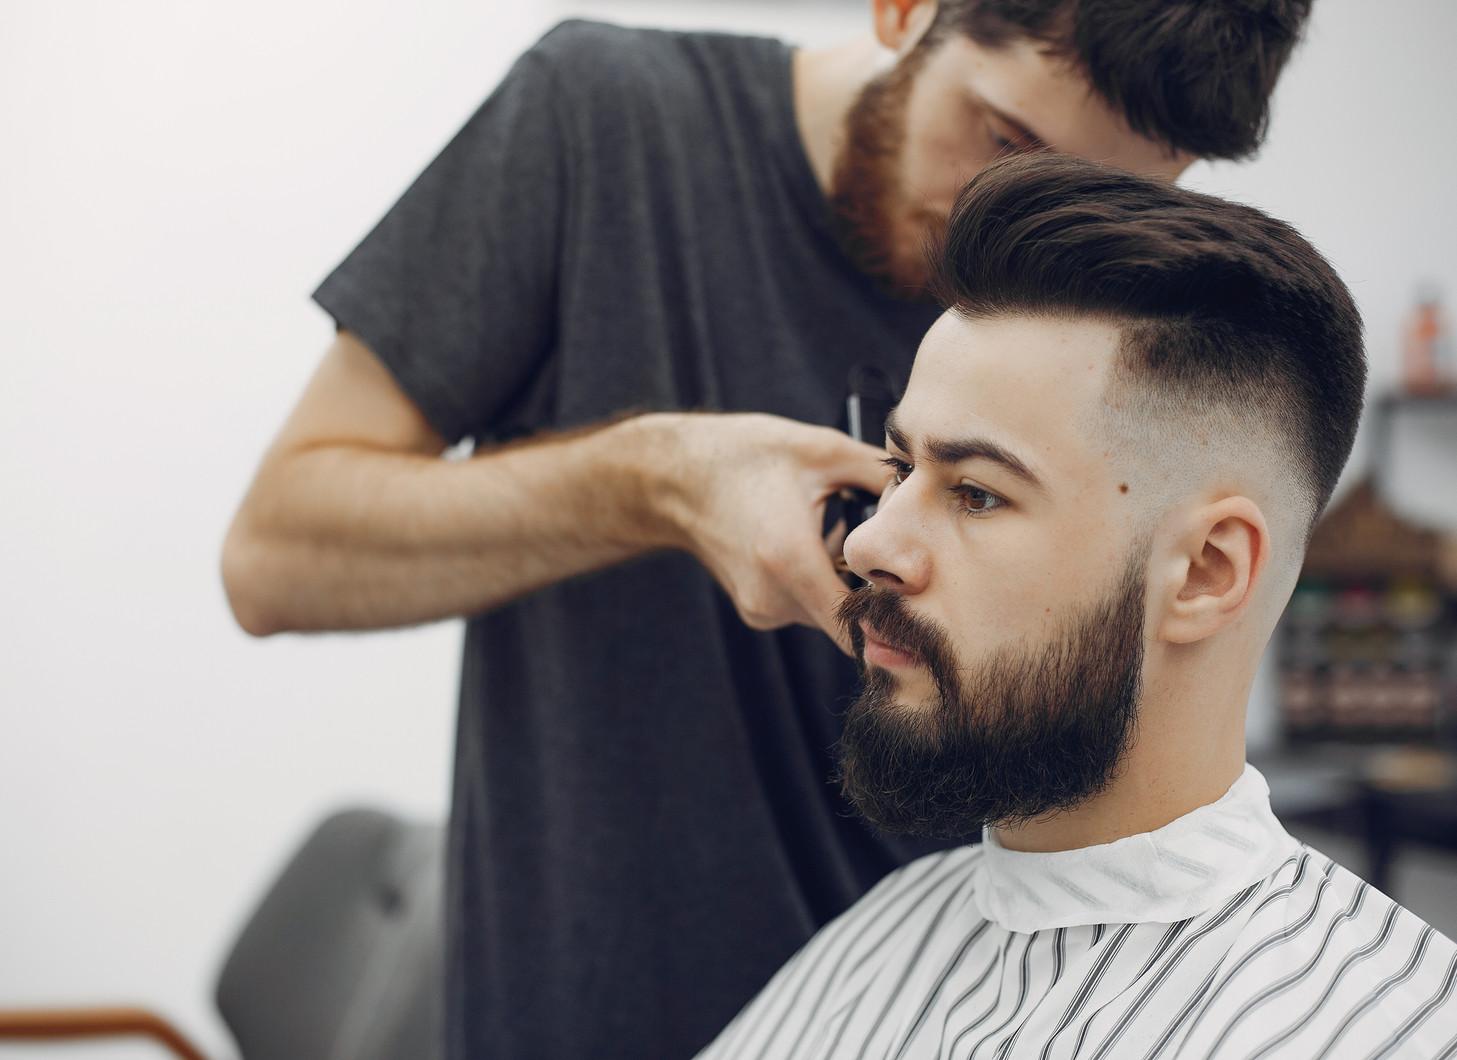 stylish-man-sitting-barbershop-3.jpg